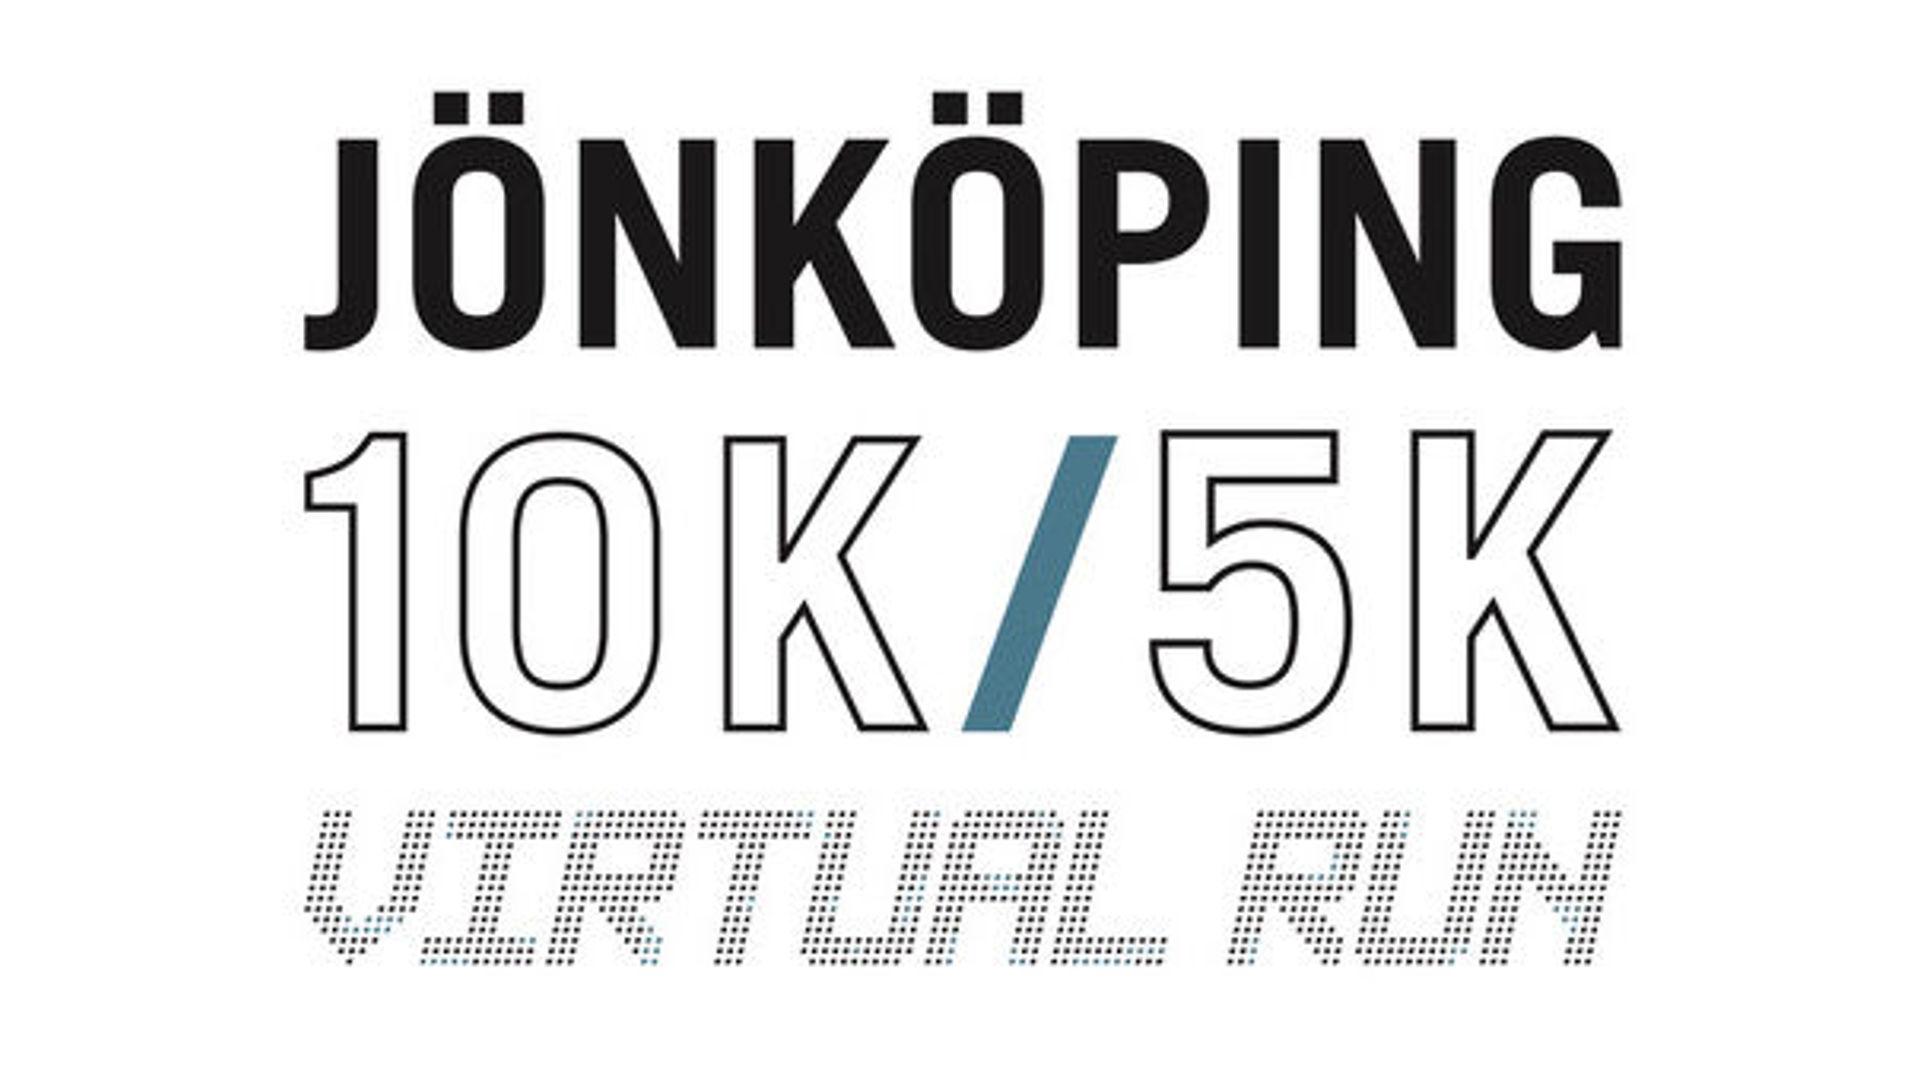 Jönköping Virtual Run 10k